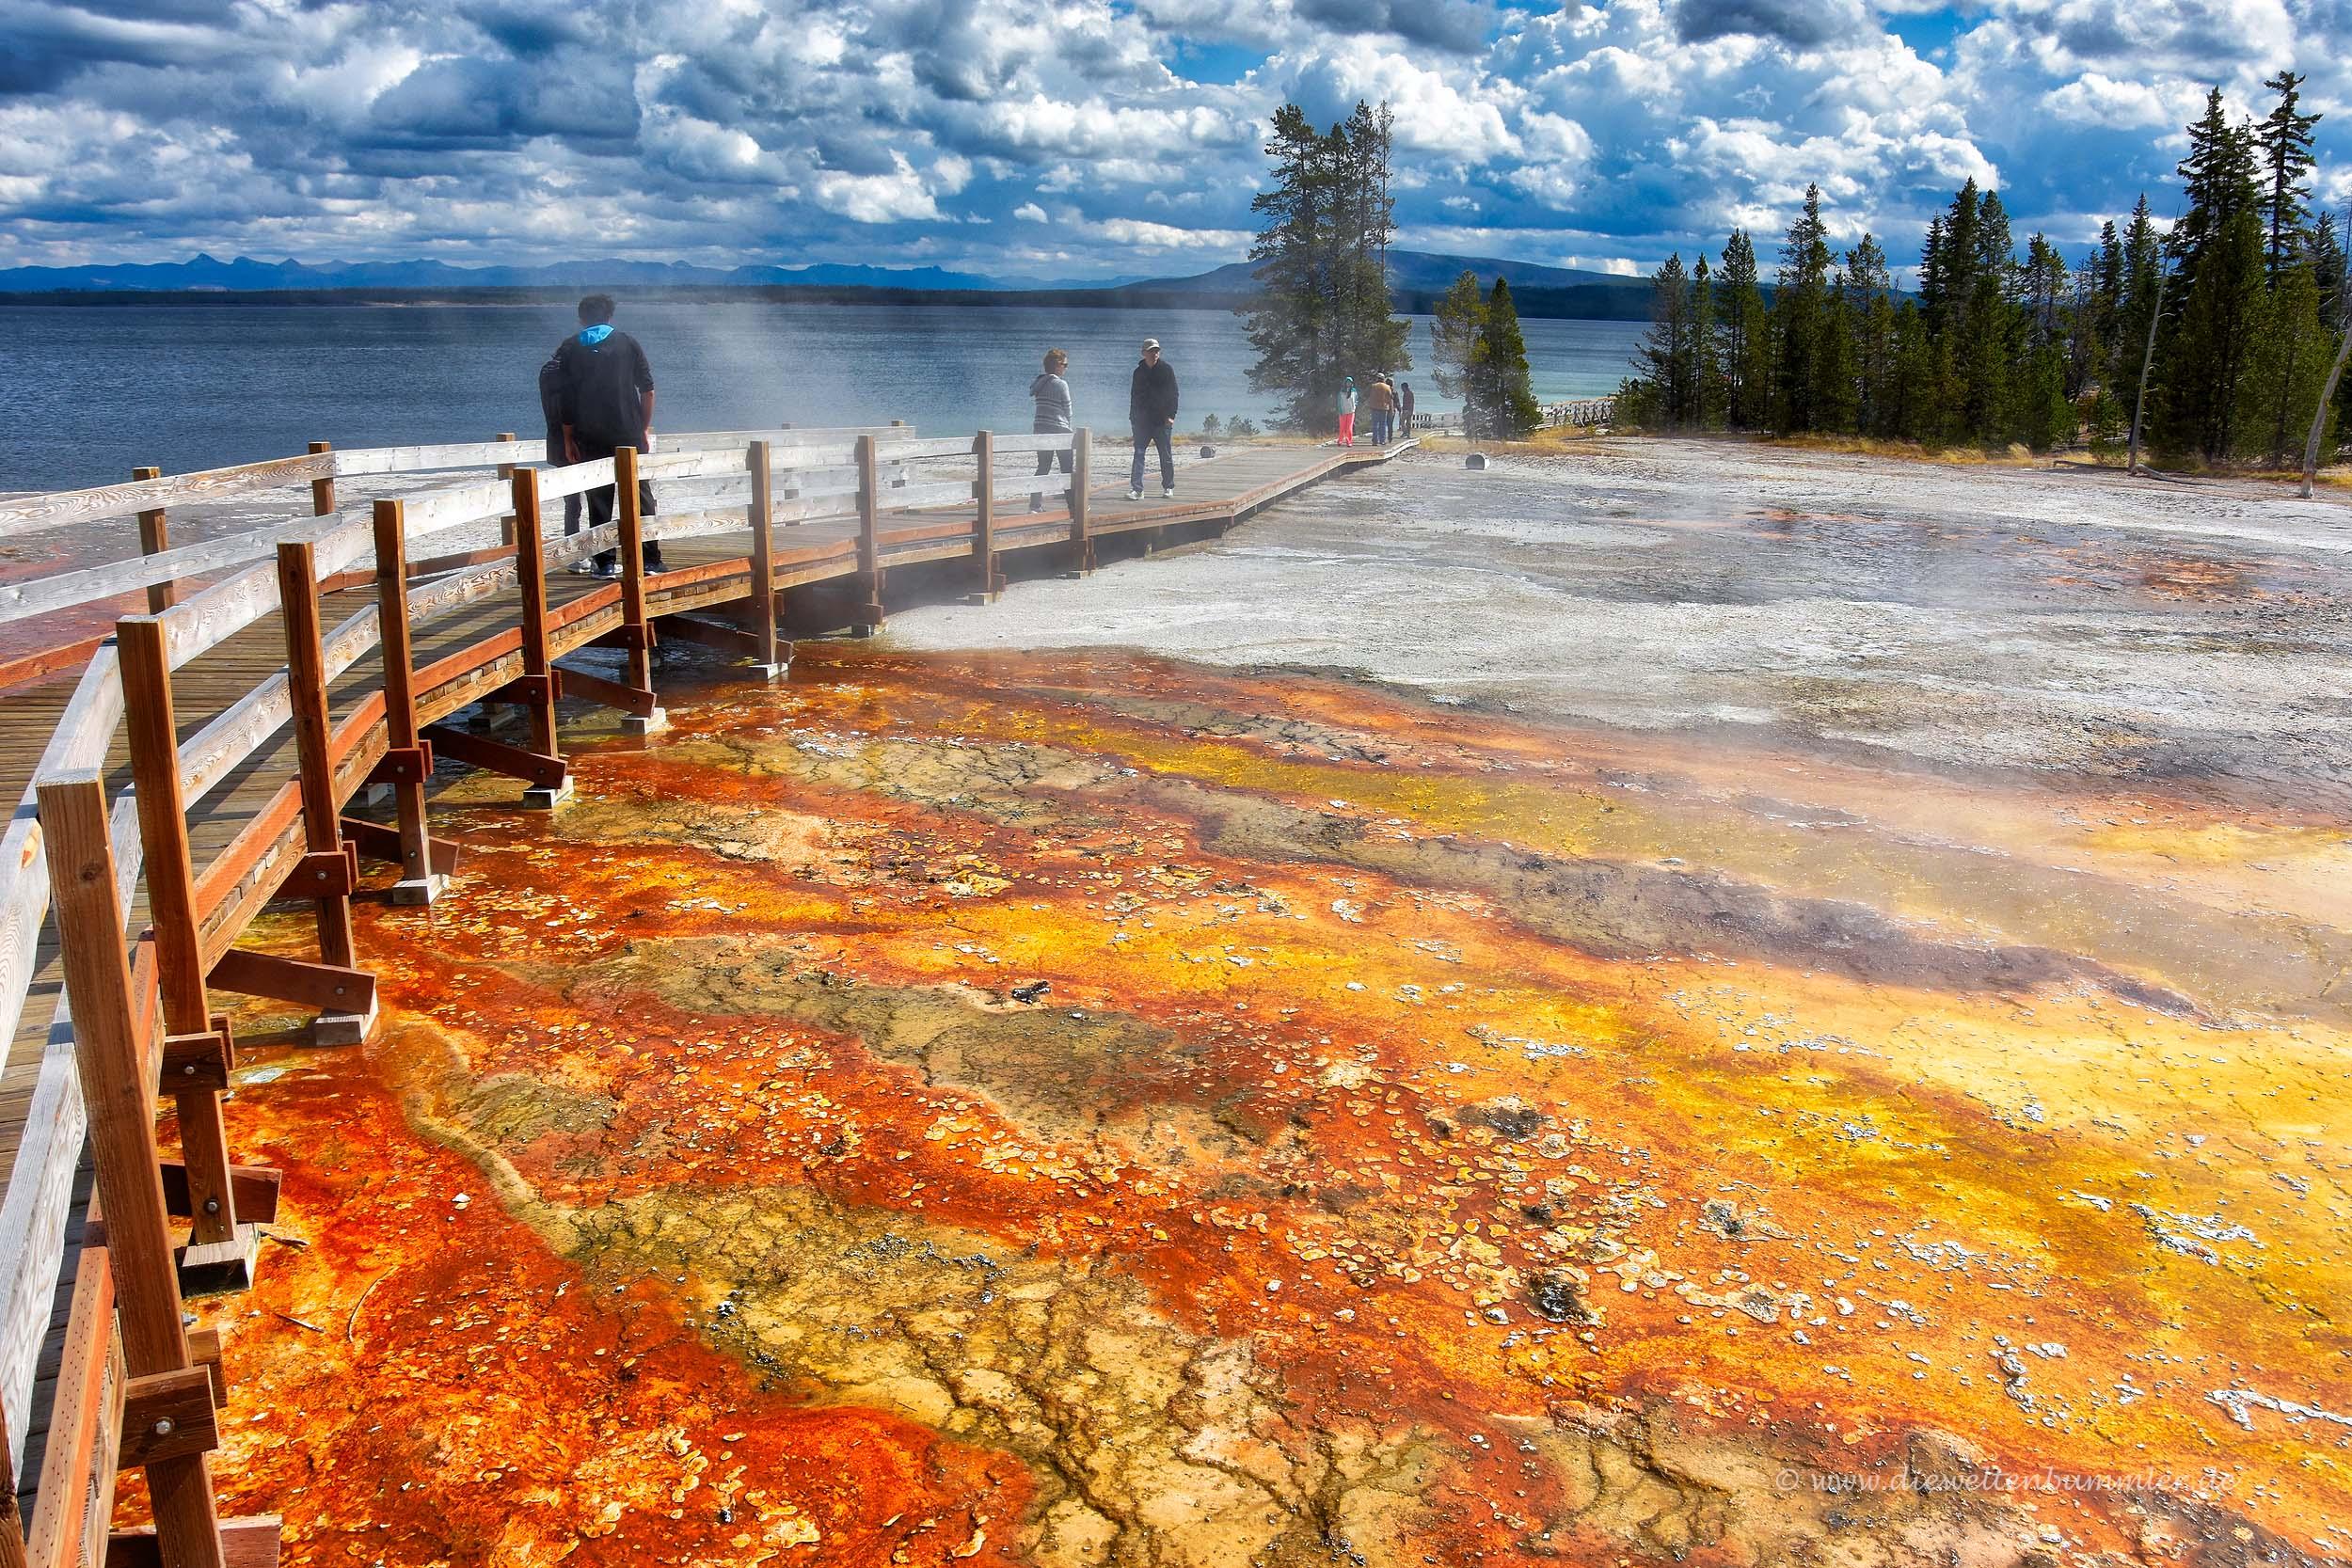 Farbenfroher Nationalpark